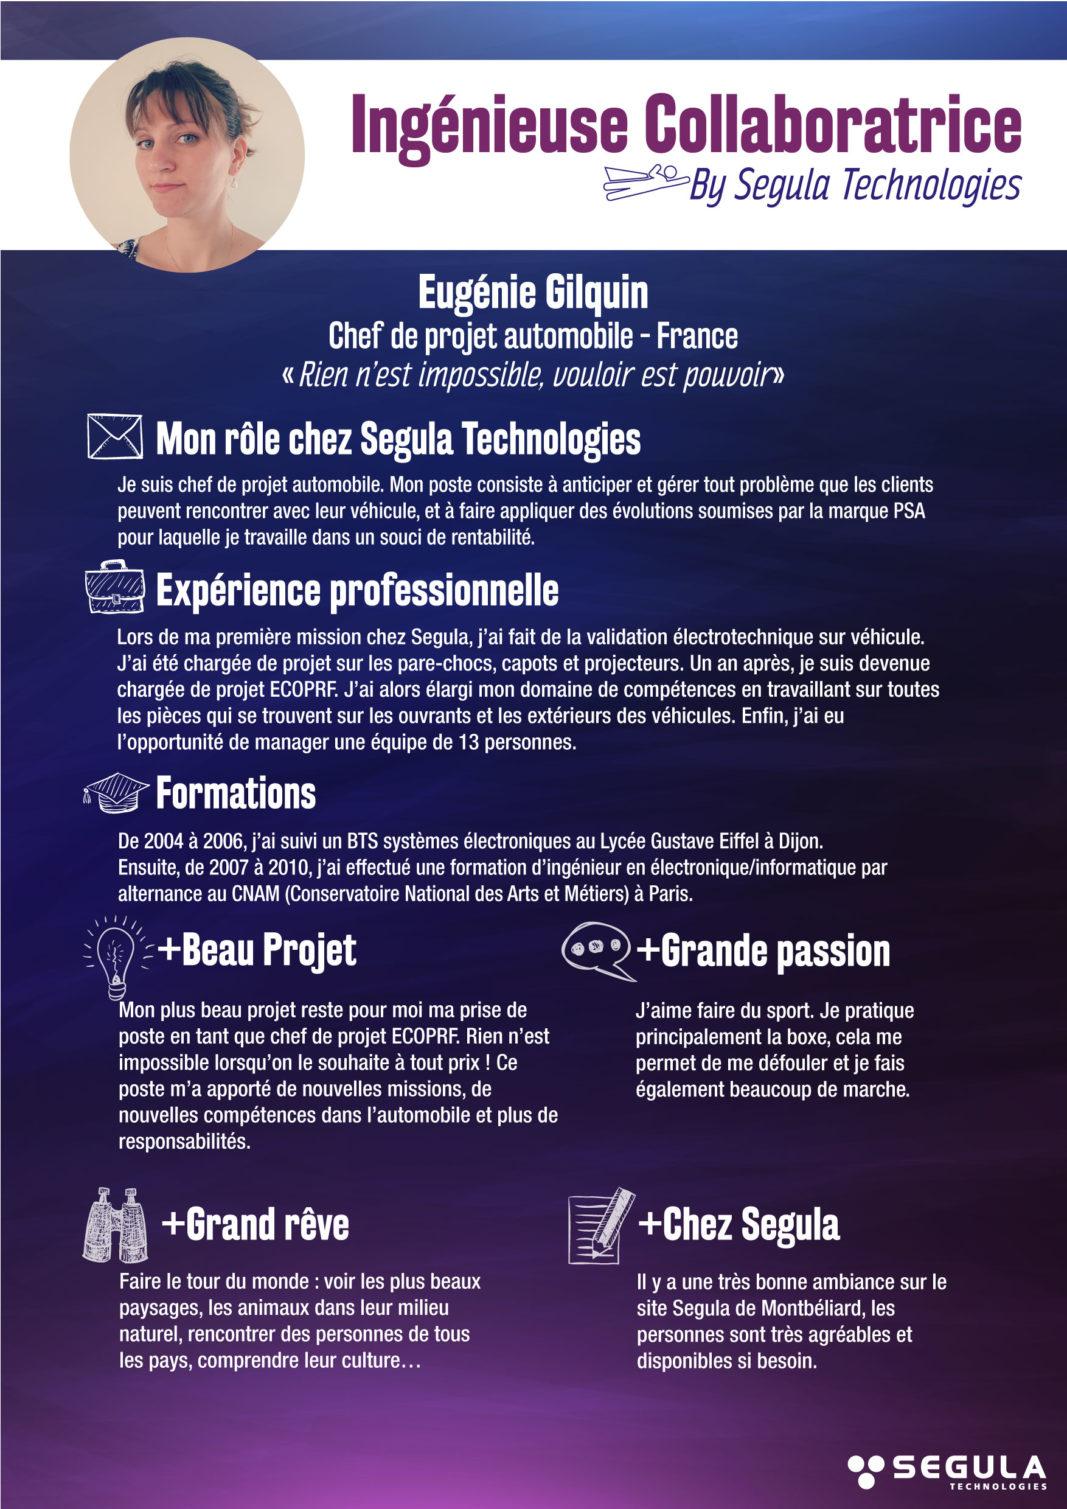 Ingenious-eugenie_gilquin-FR